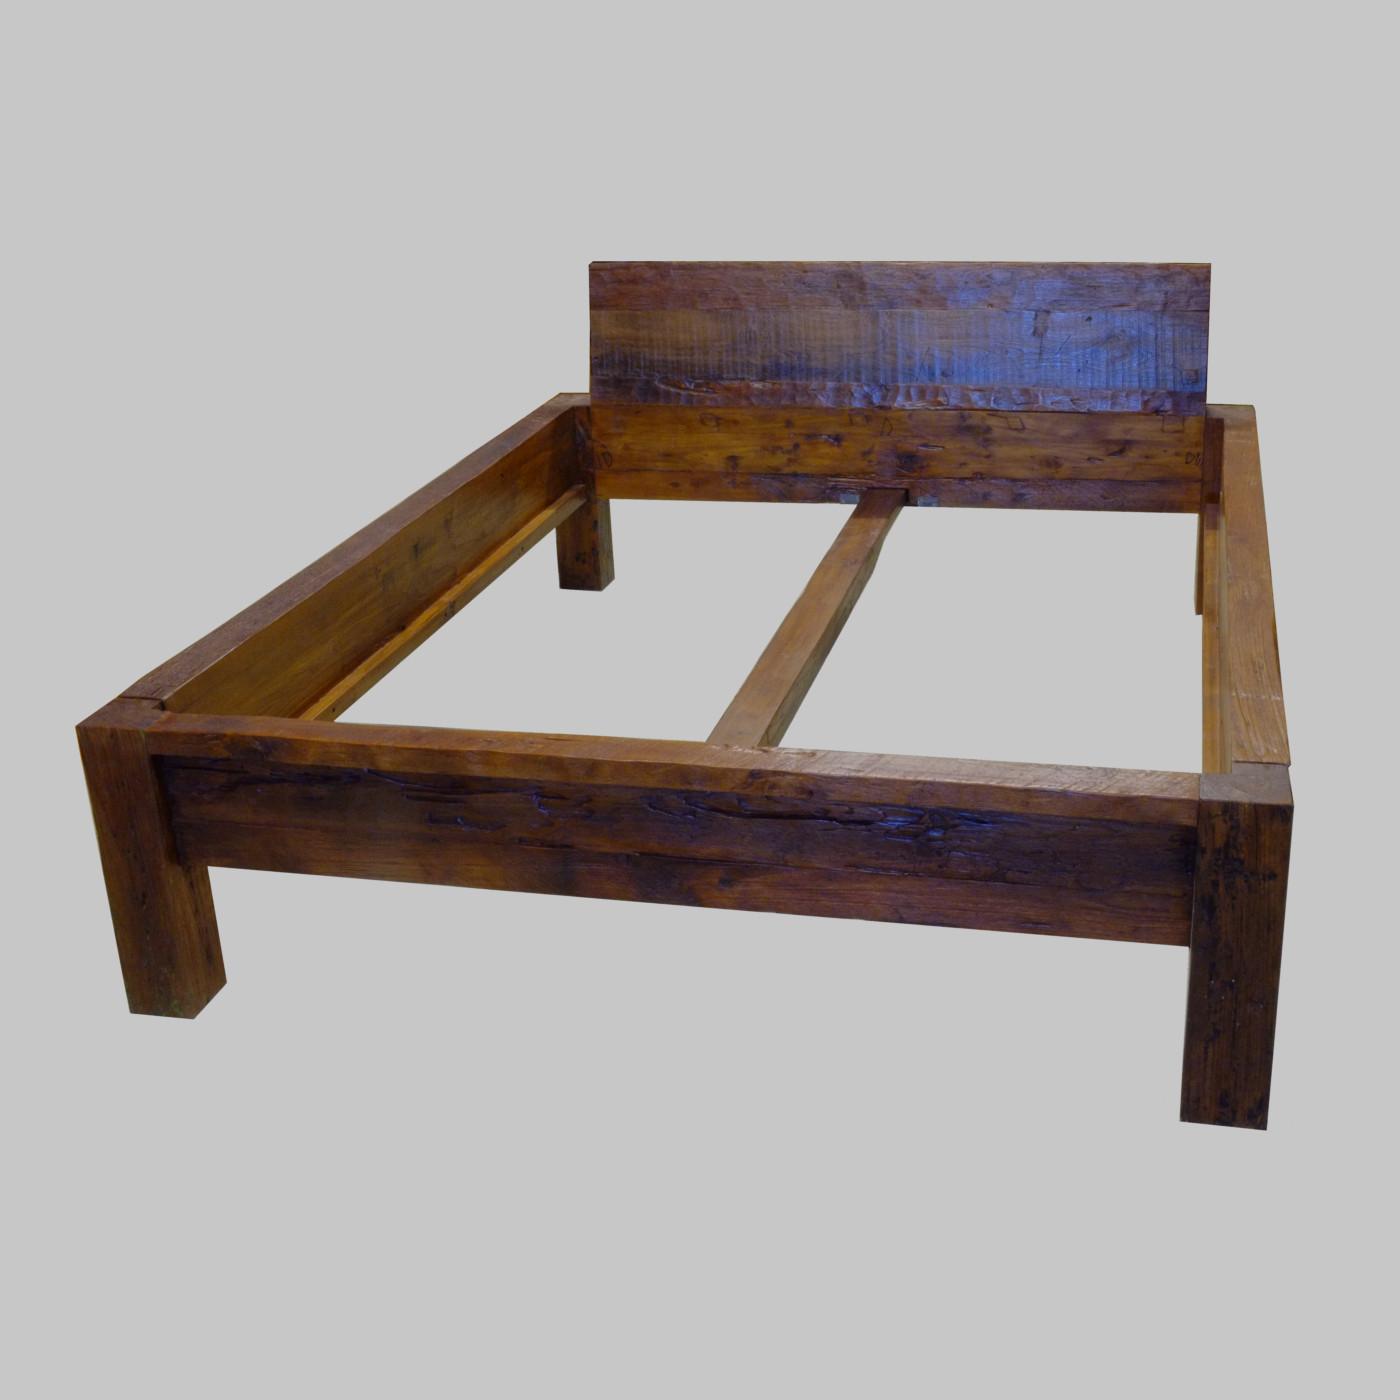 bett dalum 140 rustikal mit r ckenlehne batavia. Black Bedroom Furniture Sets. Home Design Ideas